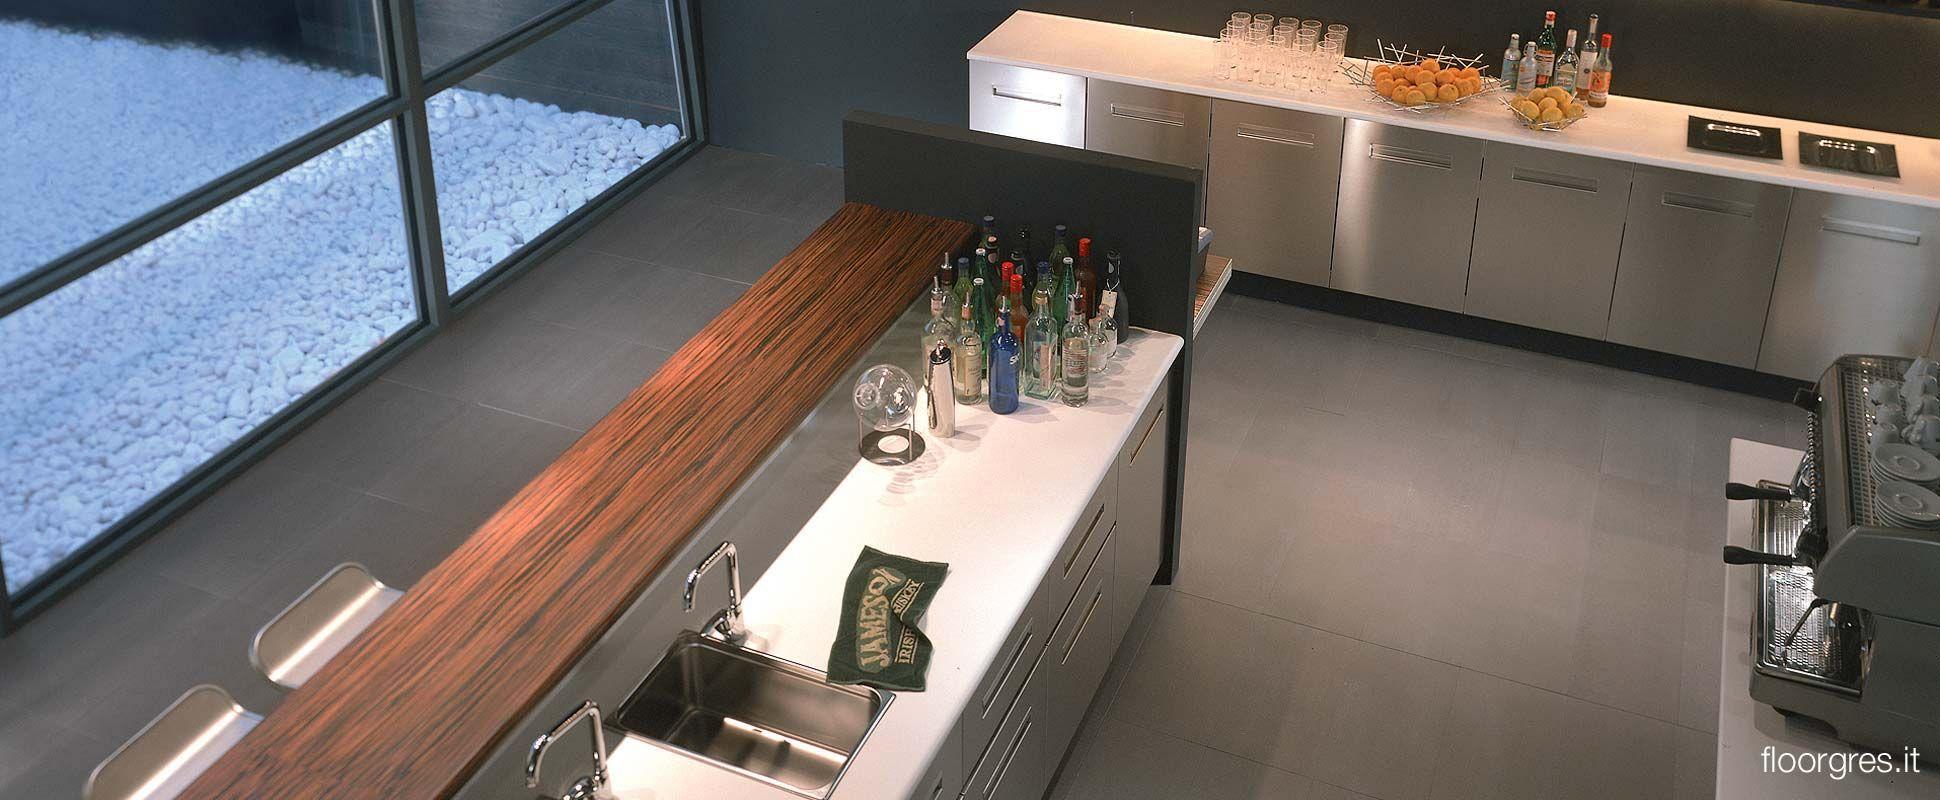 Recycled ceramic travertine tiles chromtech10 by floor gres recycled ceramic travertine tiles chromtech10 by floor gres dailygadgetfo Choice Image